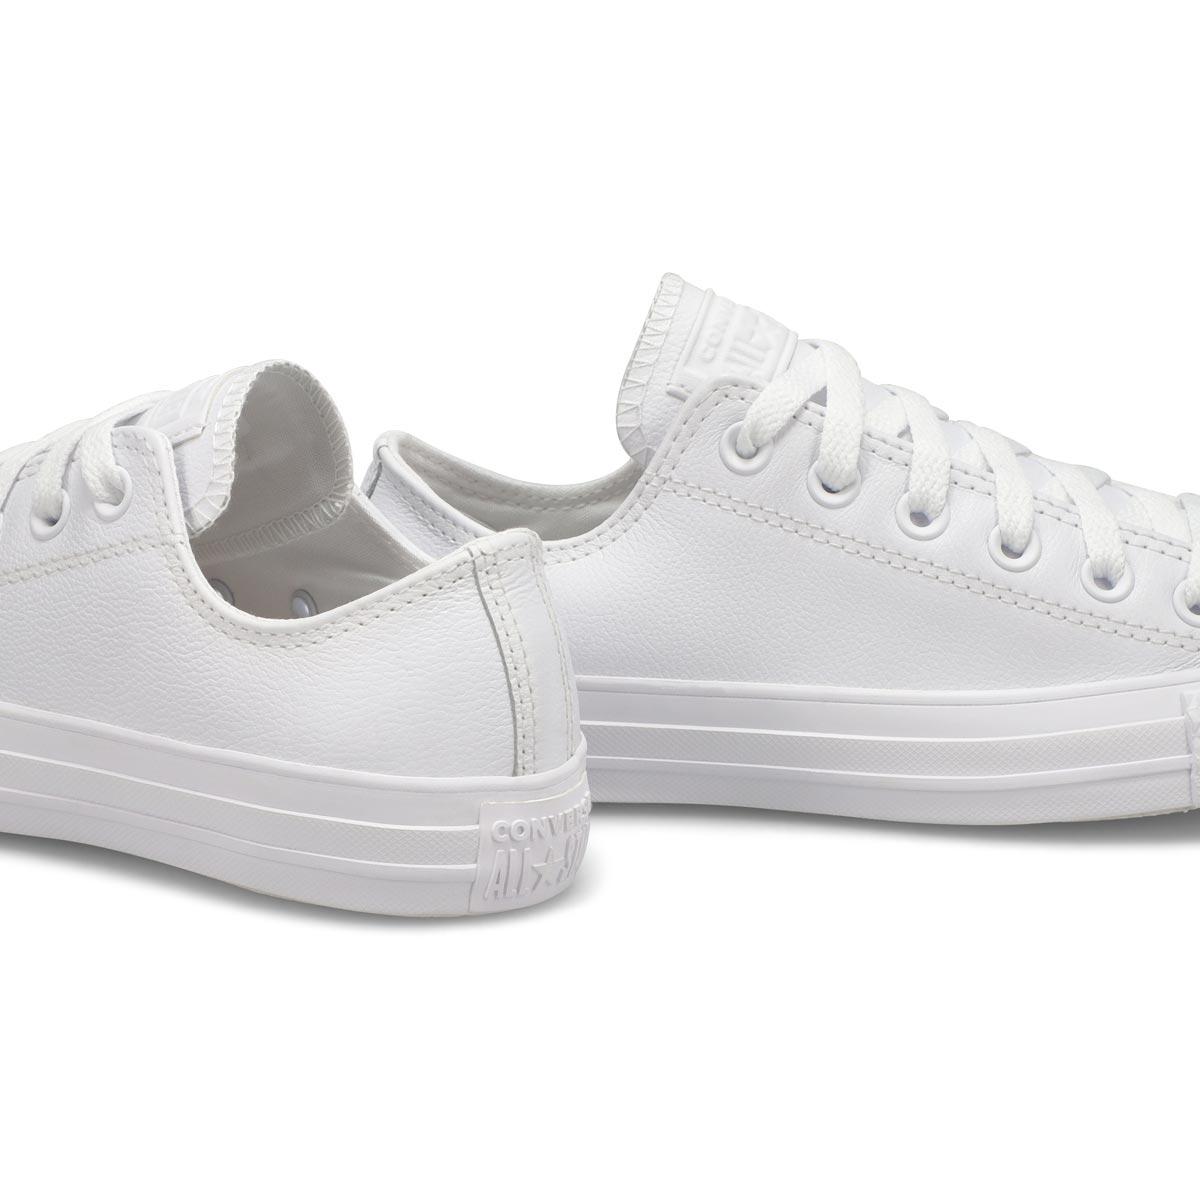 Women's All Star Leather Hi Top Sneaker -Wht